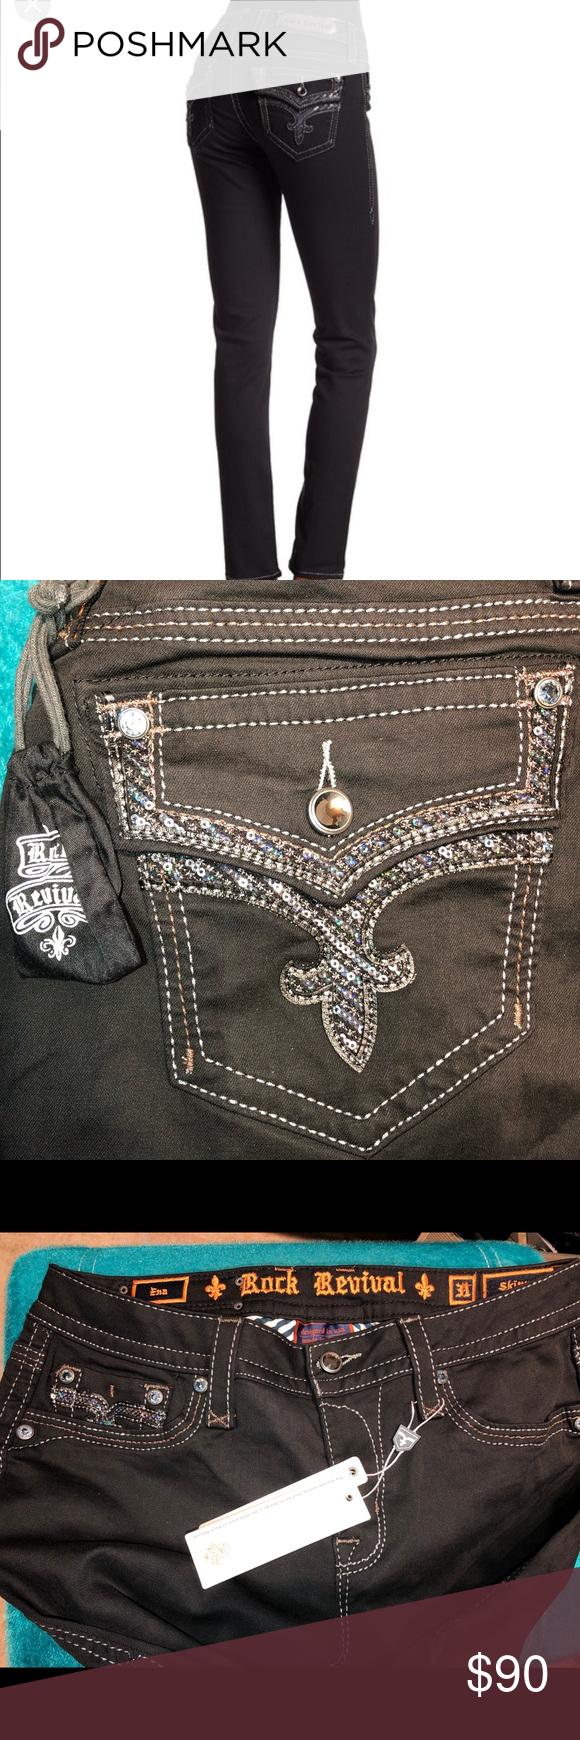 49c96e1013 Rock Revival Metallic stitch skinny jeans Rock Revival Metallic stitch  skinny jeans. NWT. Beautiful